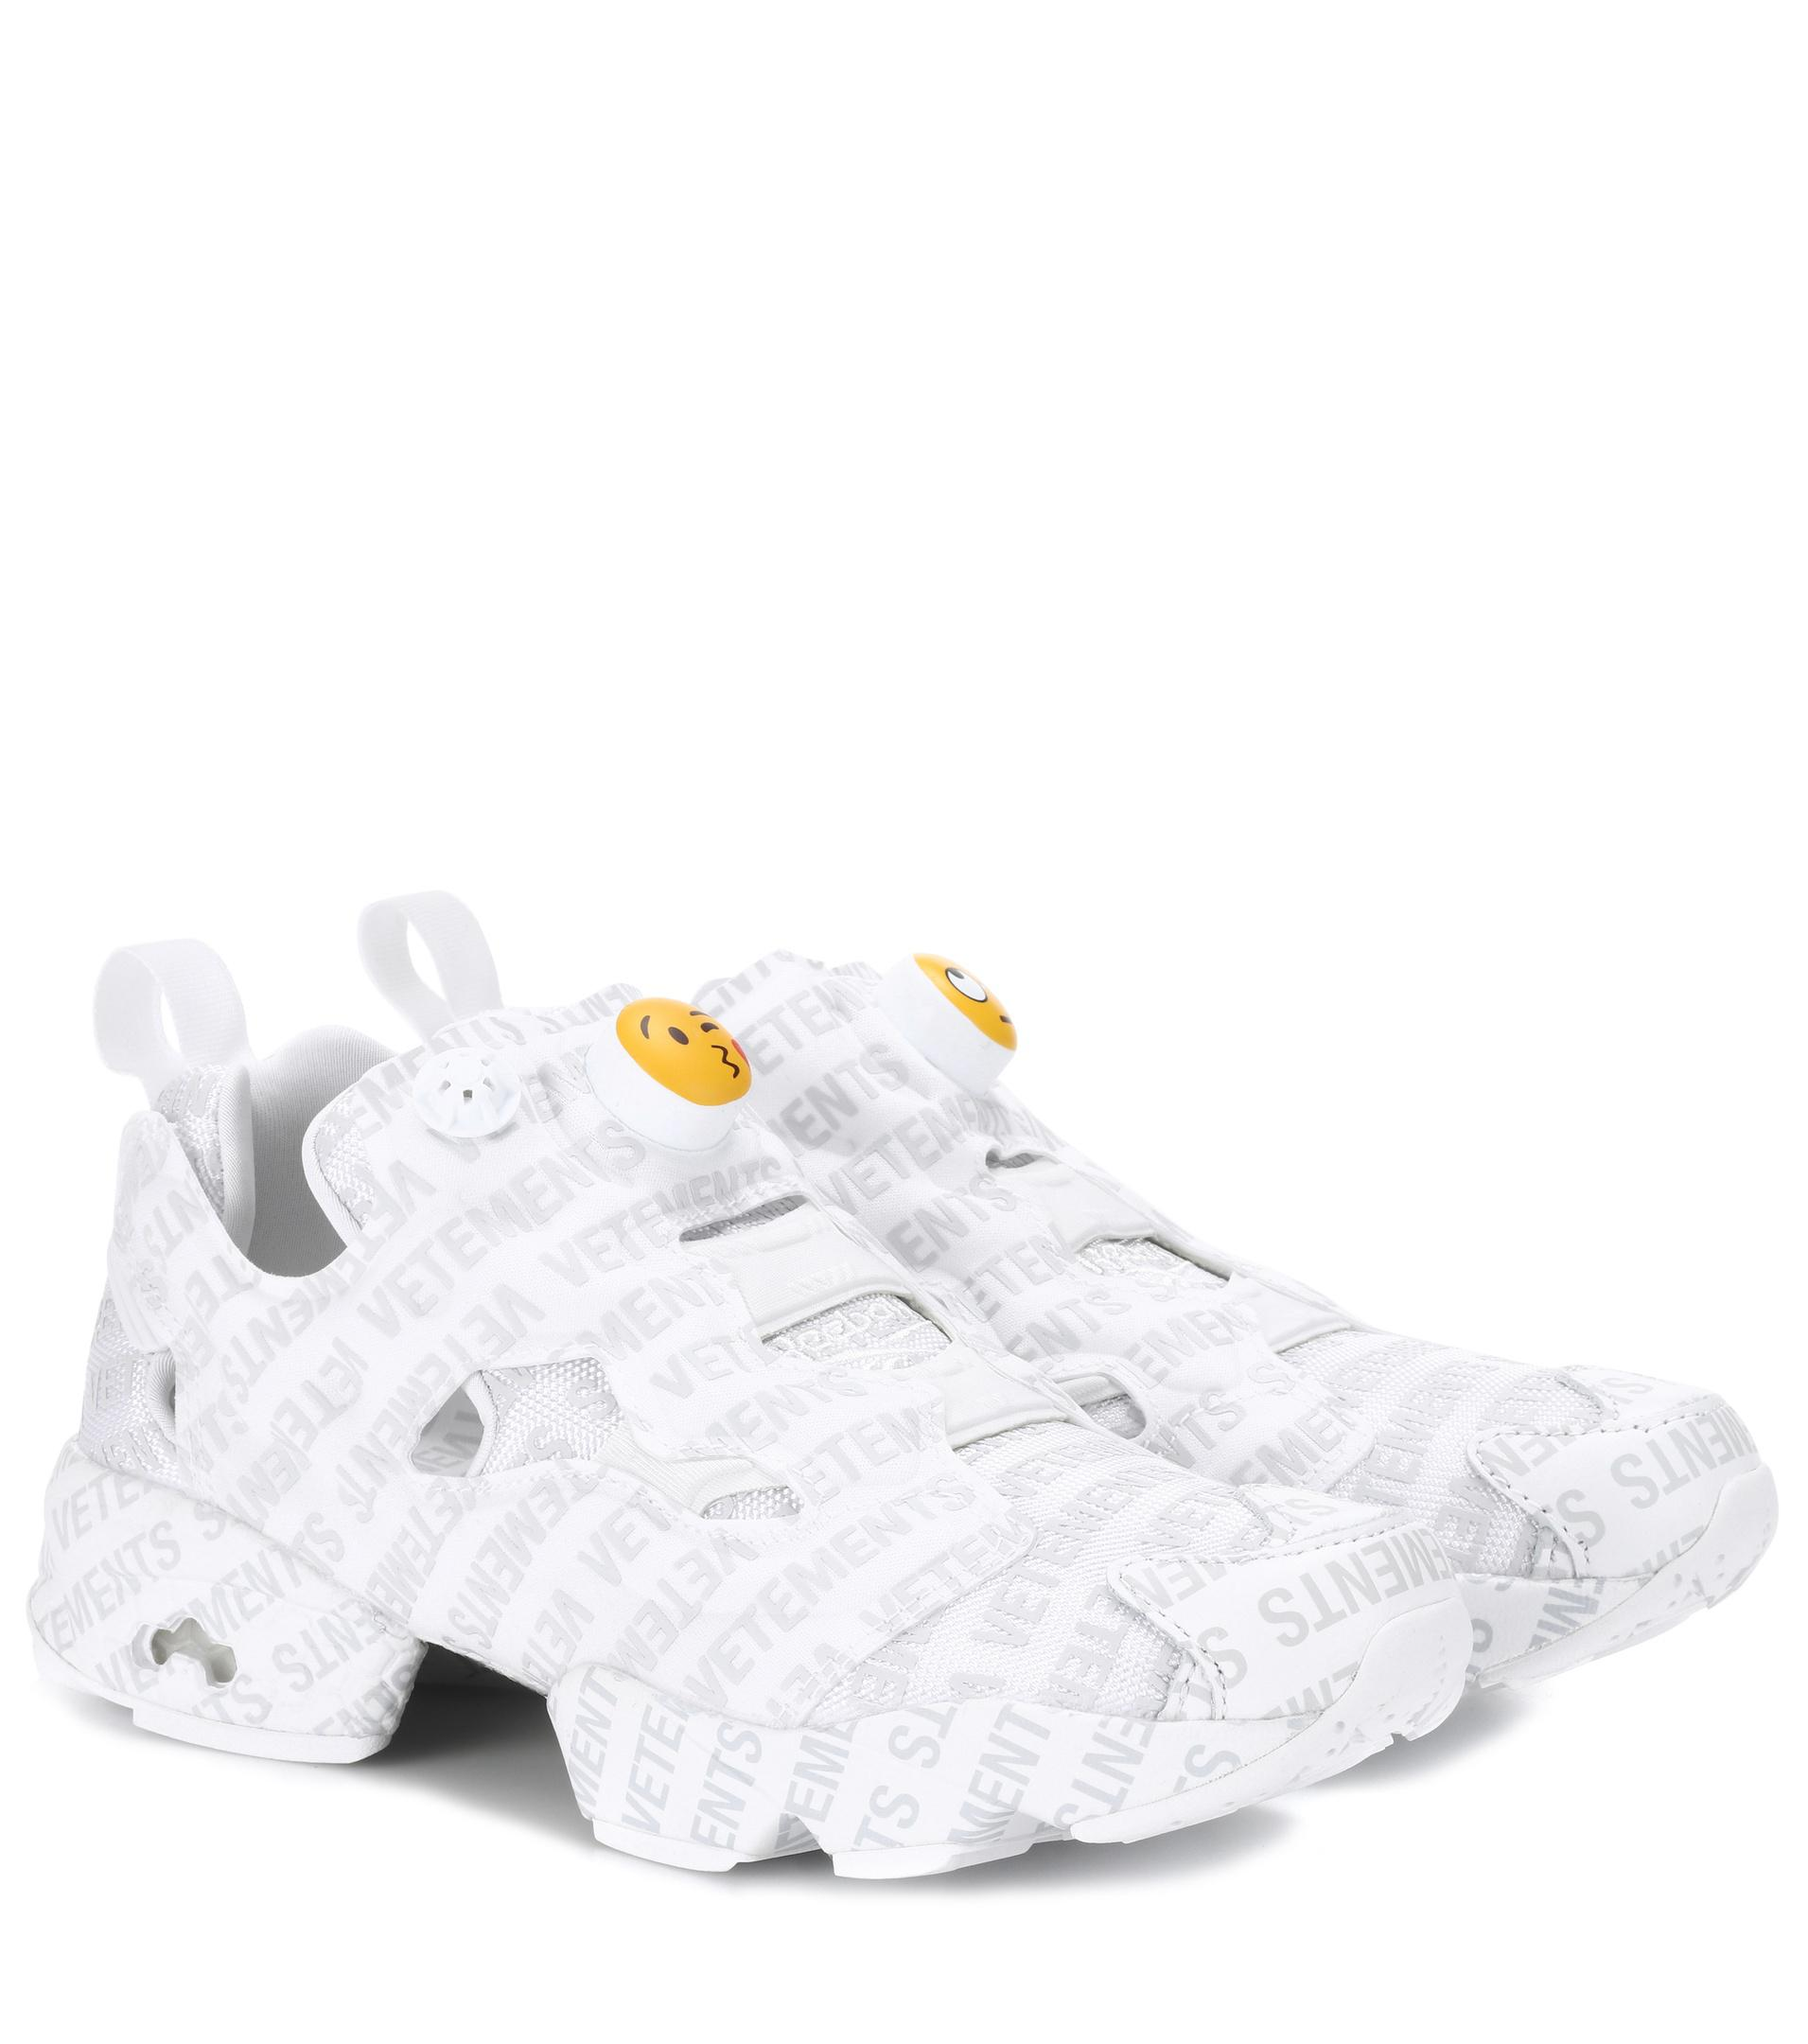 Sophia Webster White Reebok Classics Edition Logo Emoji Instapump Fury Sneakers 60riDeDtXo